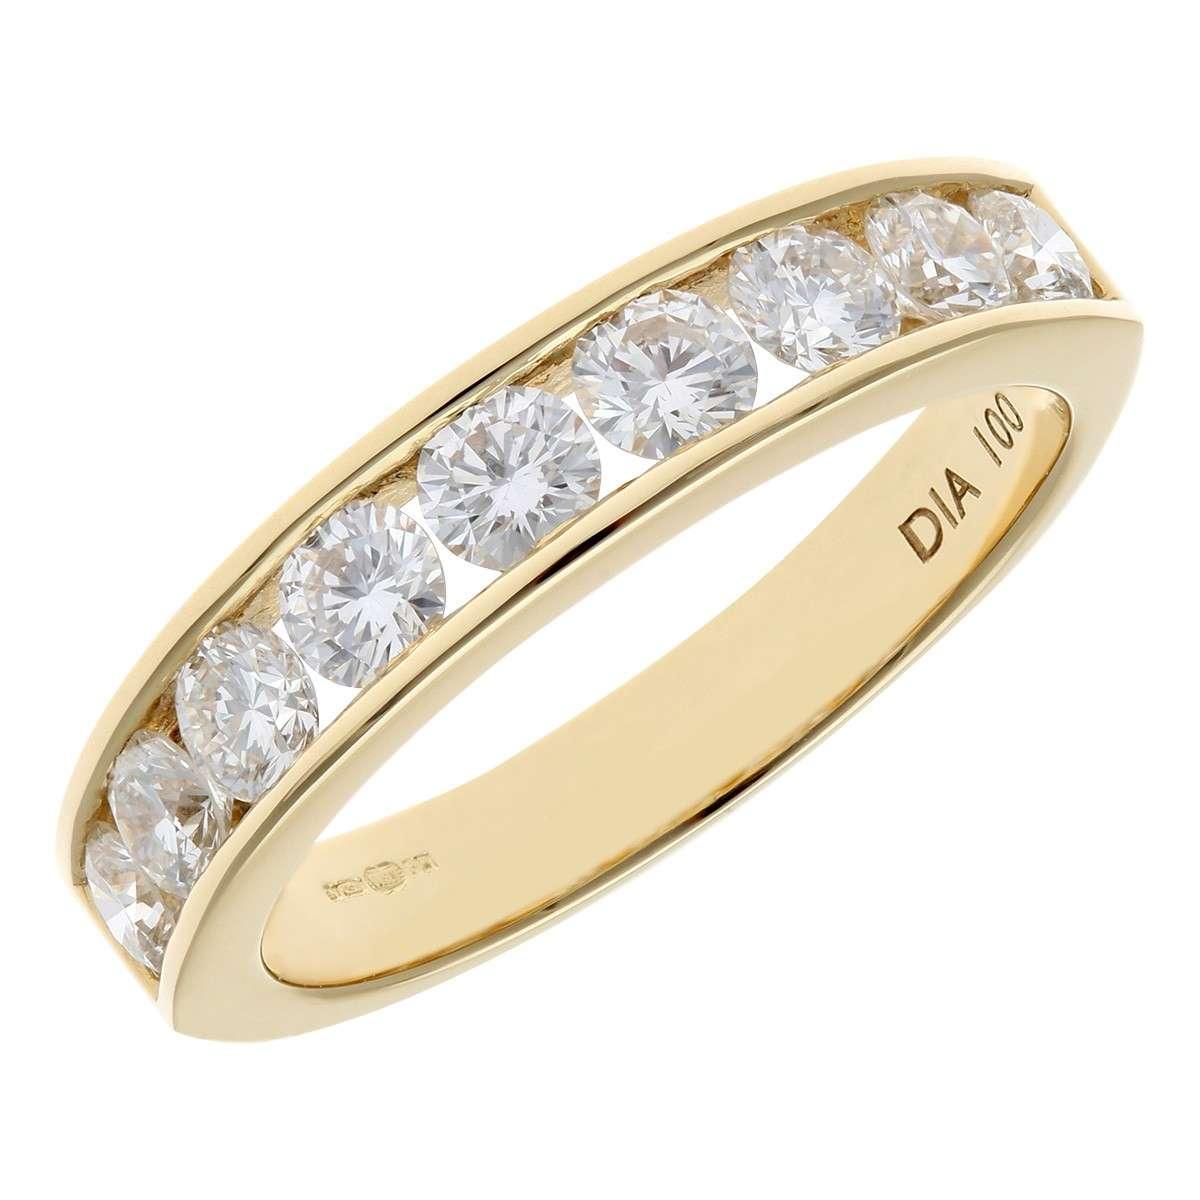 18CT YELLOW GOLD 1.00CT DIAMOND 9 STONE CHANNEL SET 1/2 ETERNITY RING